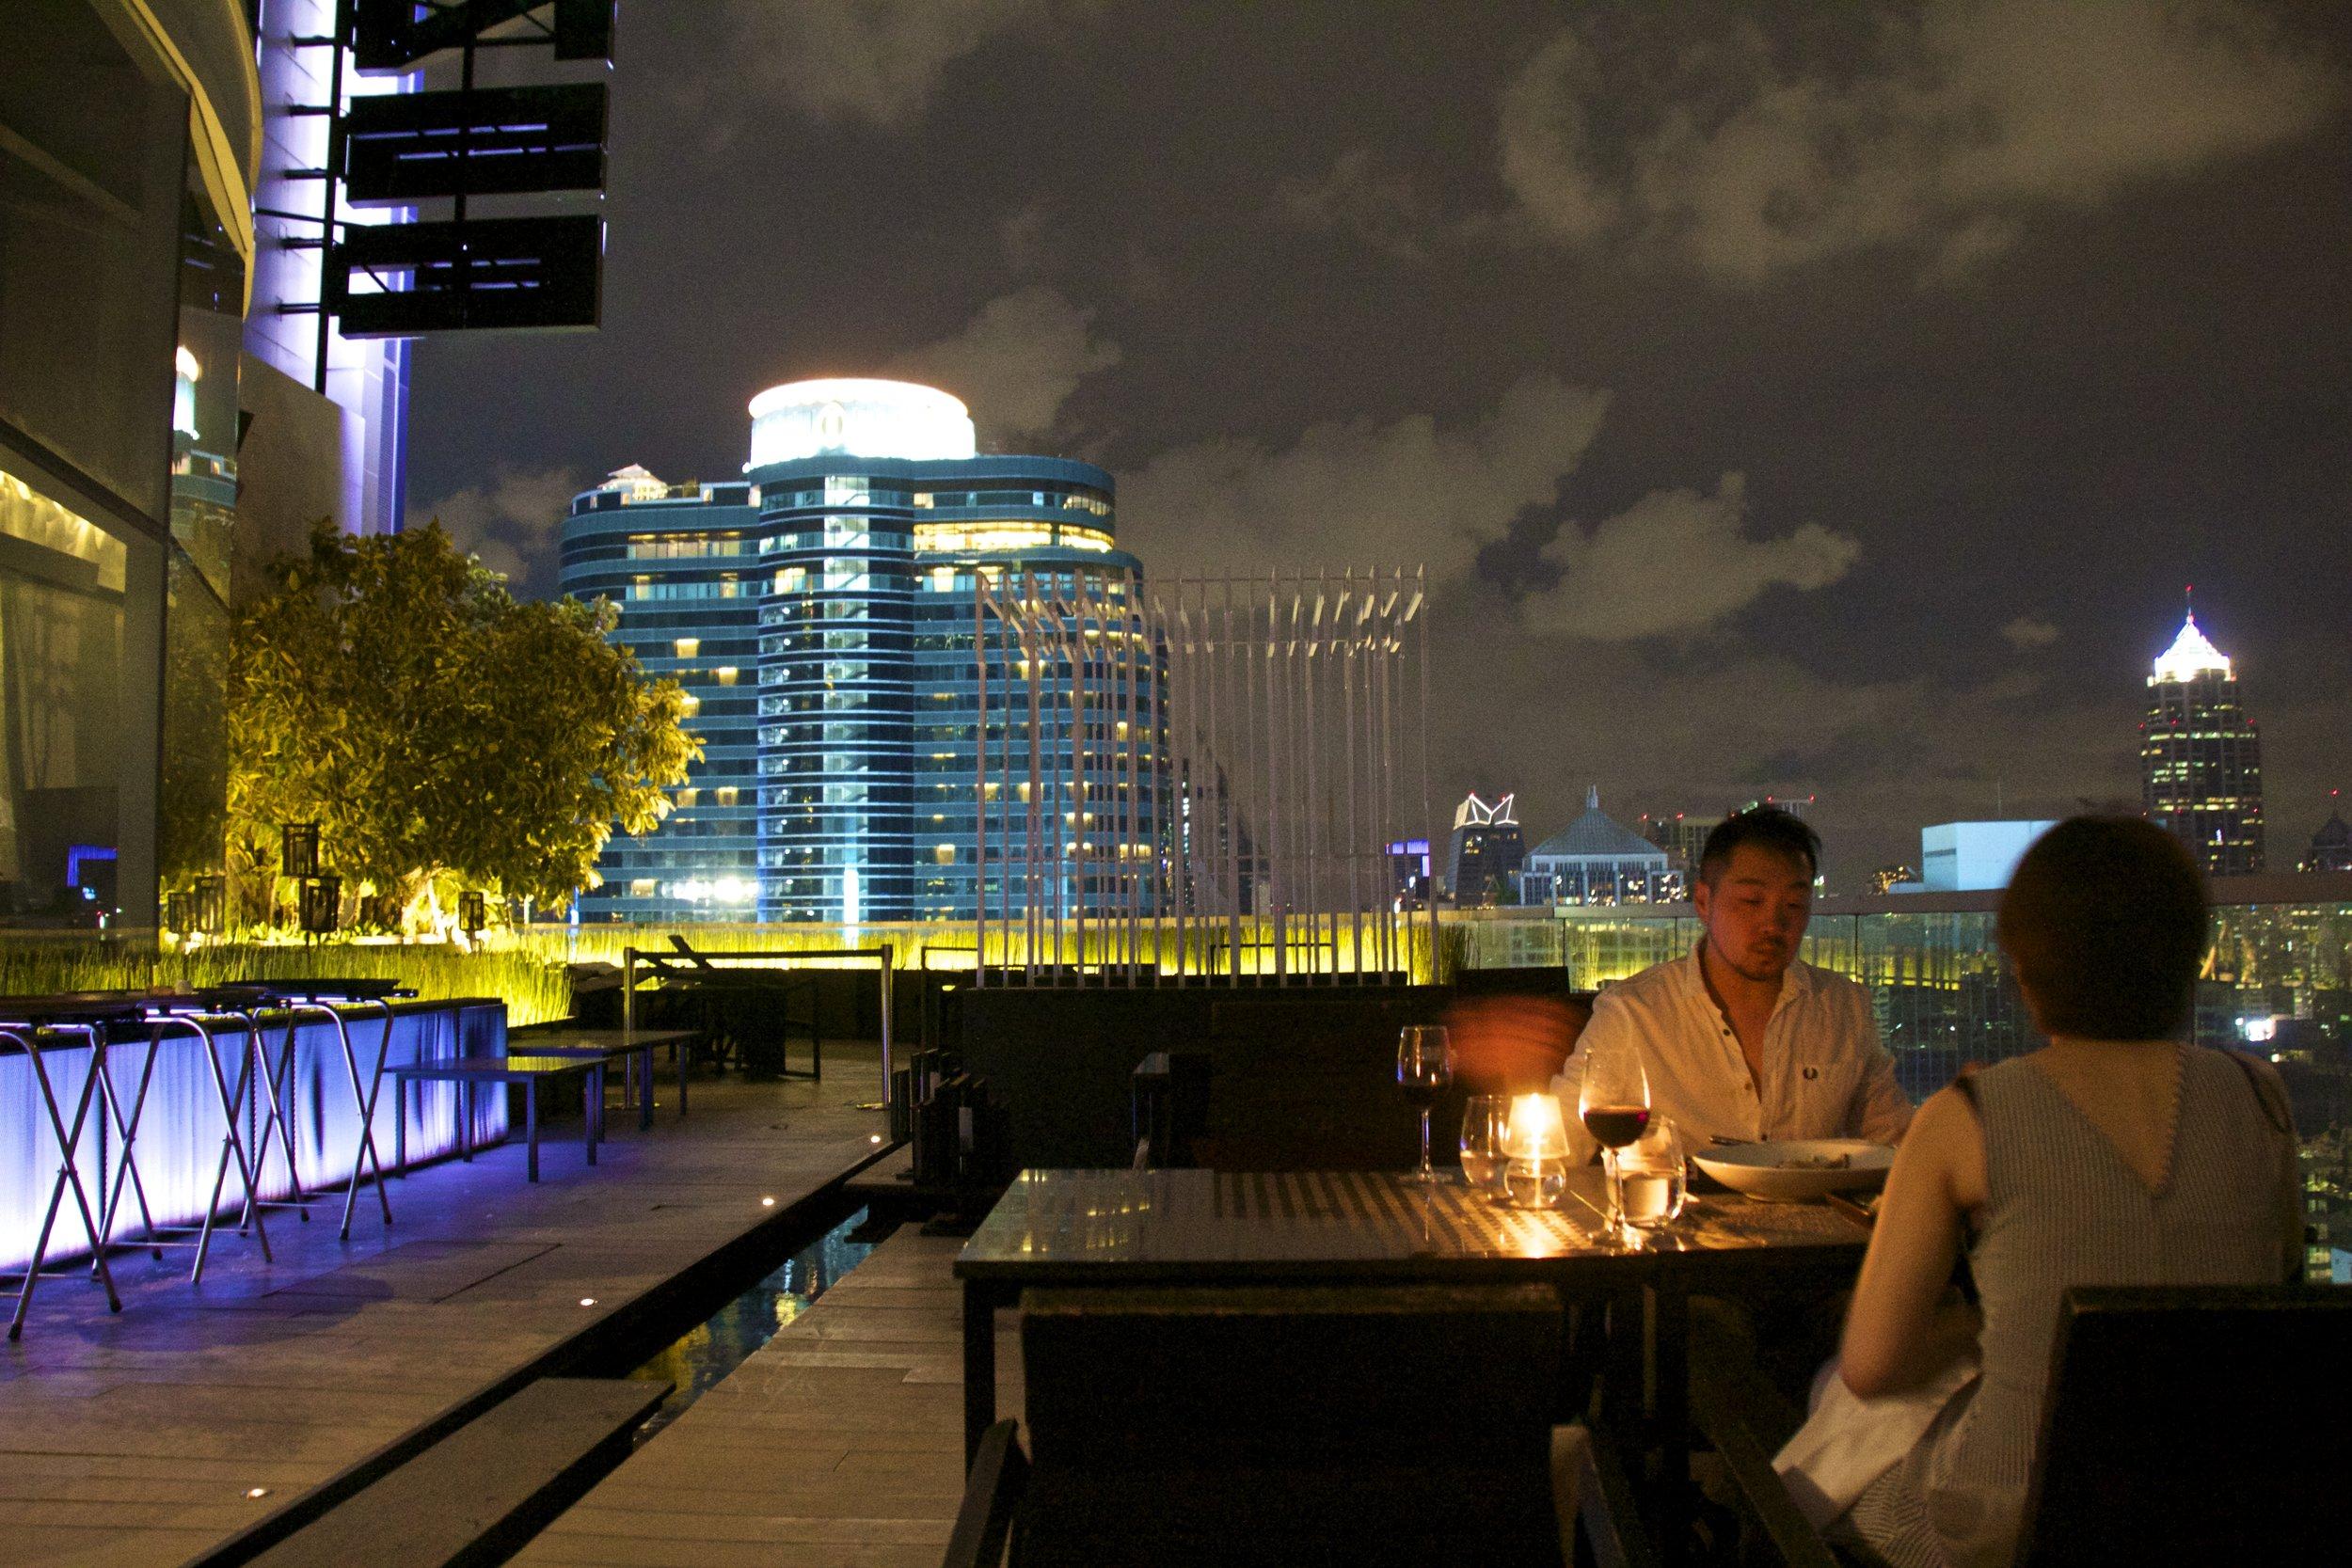 zense bangkok thailand rooftop bars nightlife 6.jpg